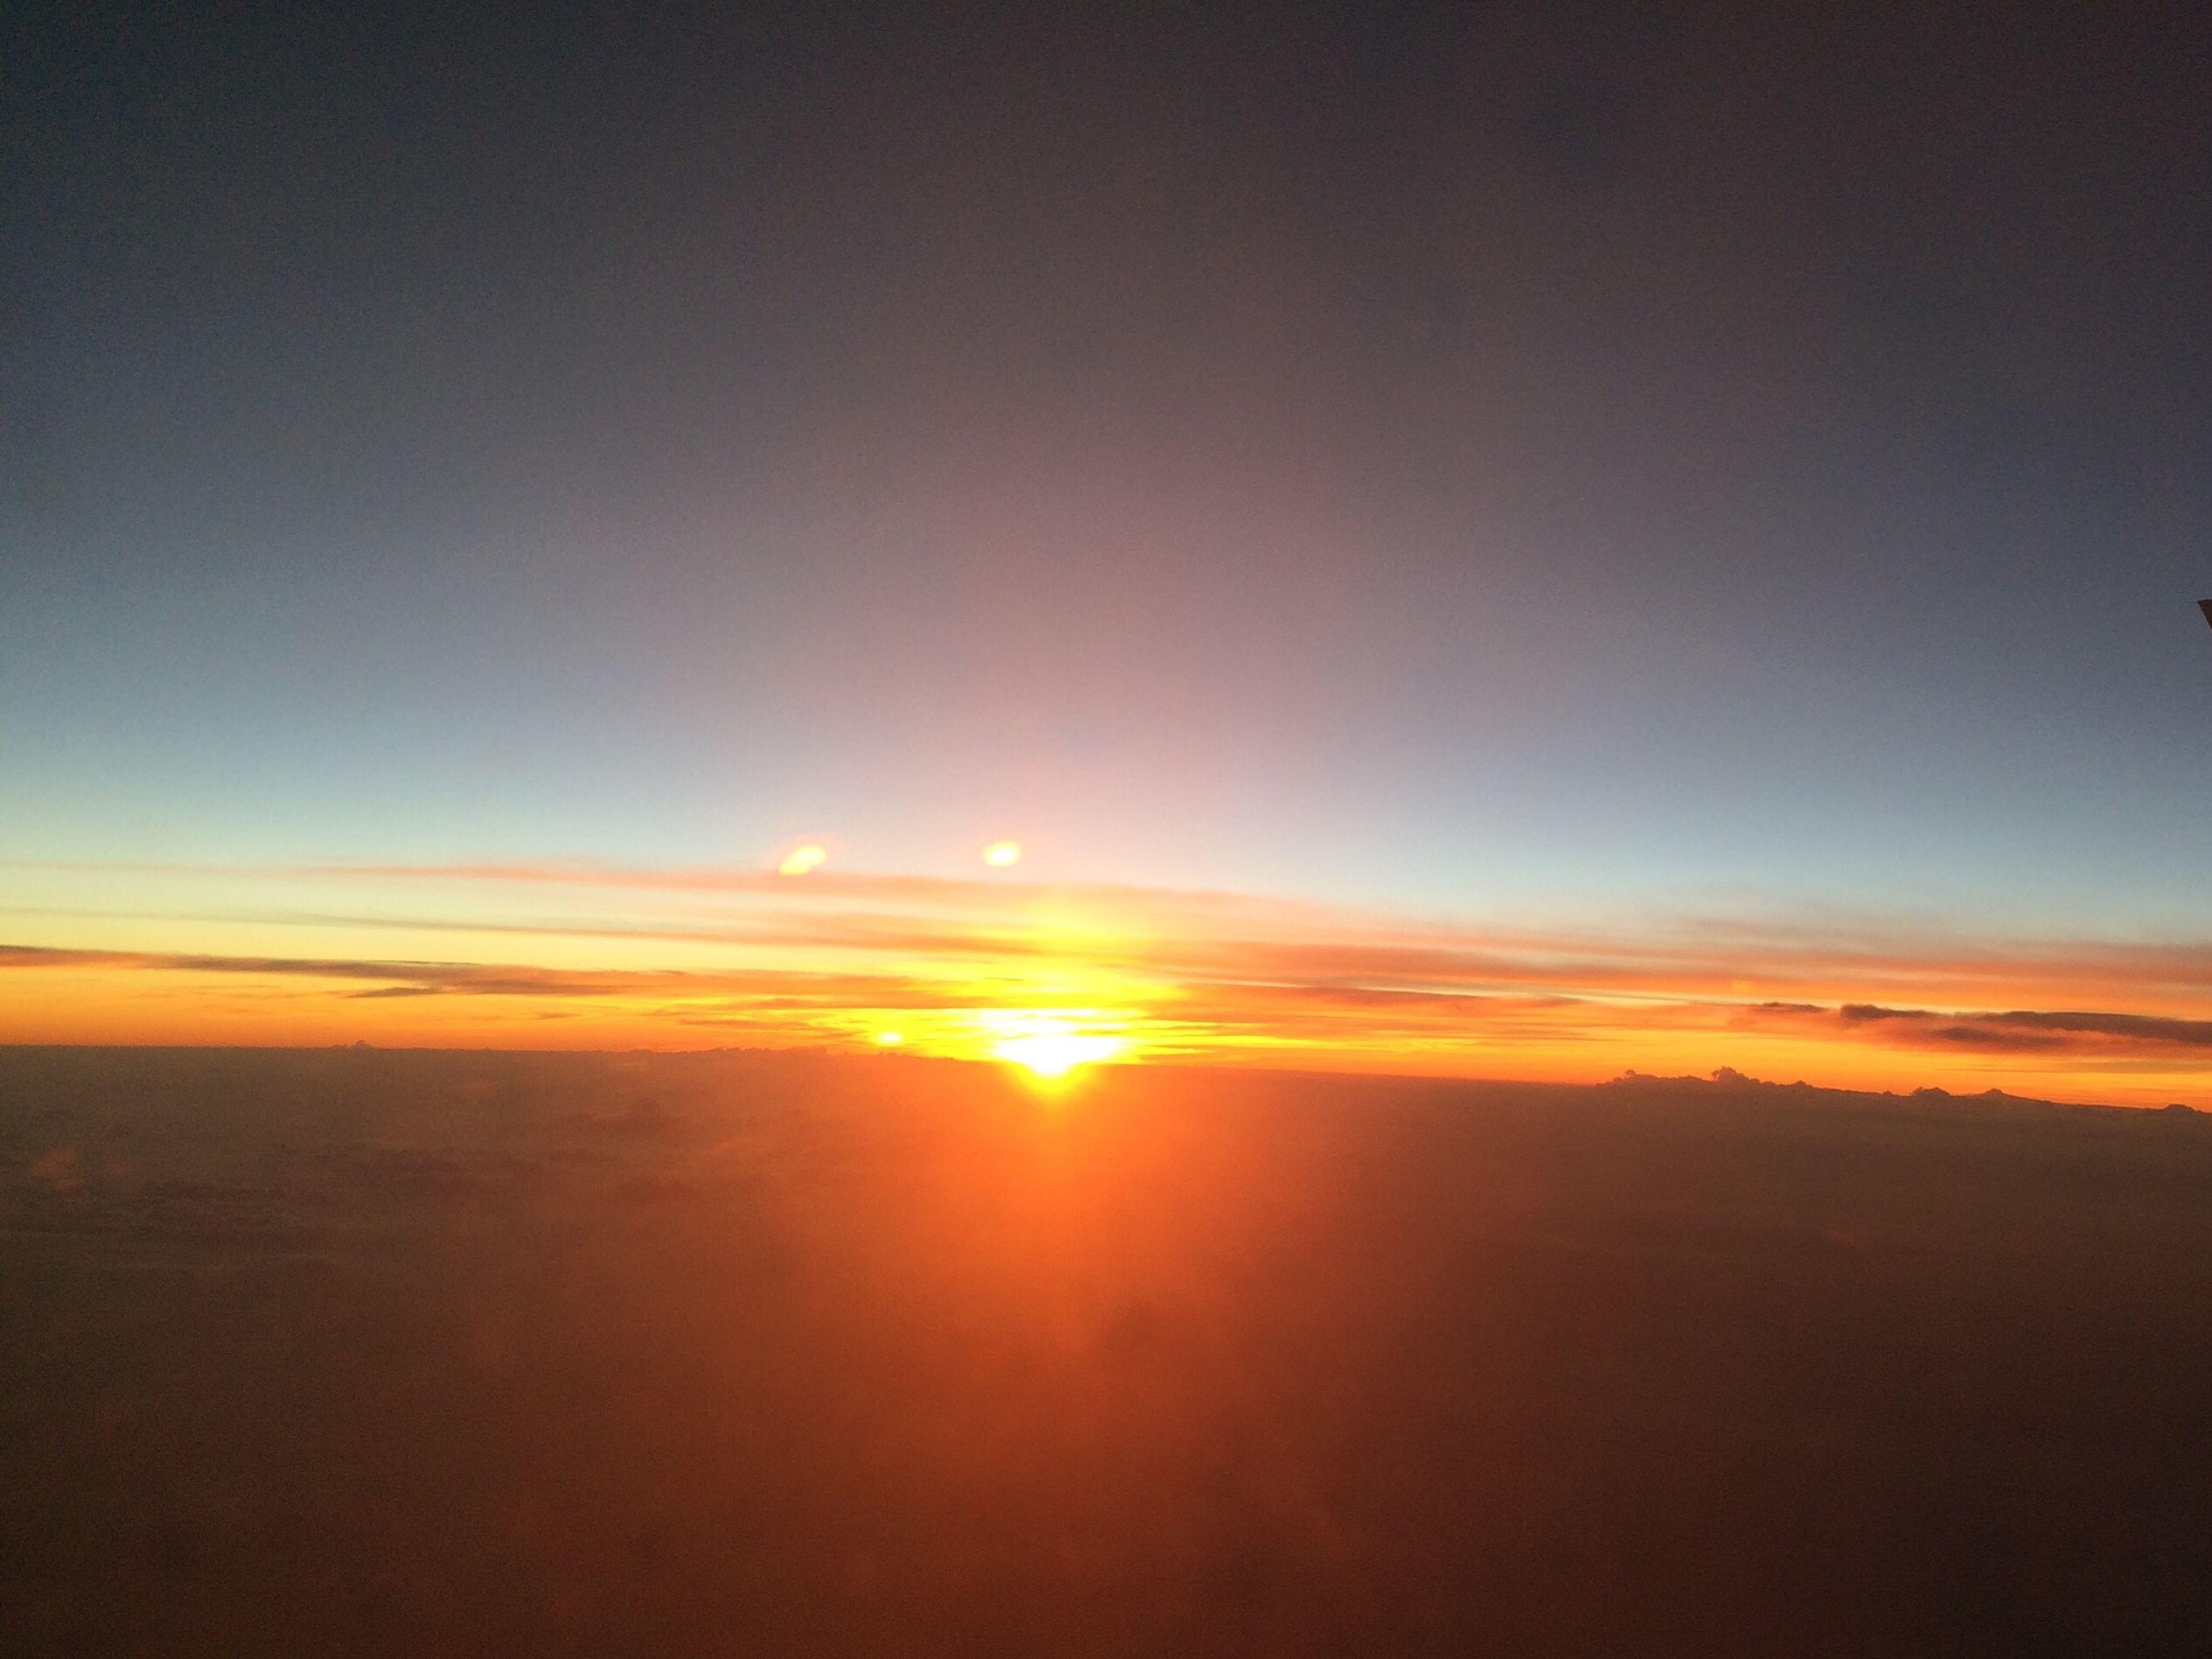 sunset, scenics, tranquil scene, sun, tranquility, beauty in nature, orange color, sky, idyllic, nature, silhouette, landscape, sunlight, copy space, cloud - sky, cloud, outdoors, horizon over land, majestic, no people